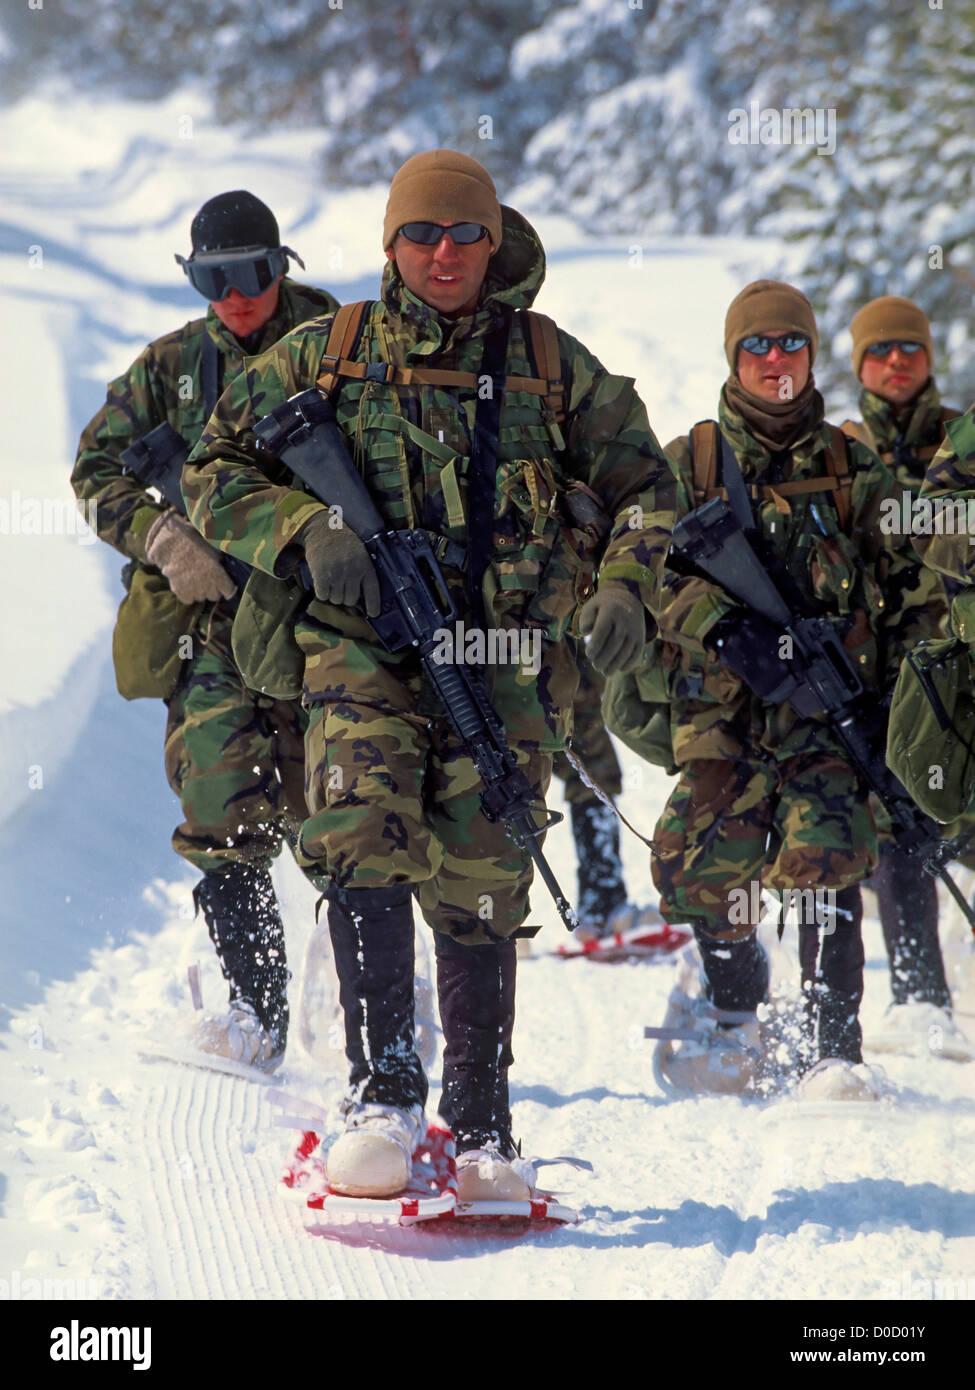 Marine Corps Mountain Warfare Training - Stock Image